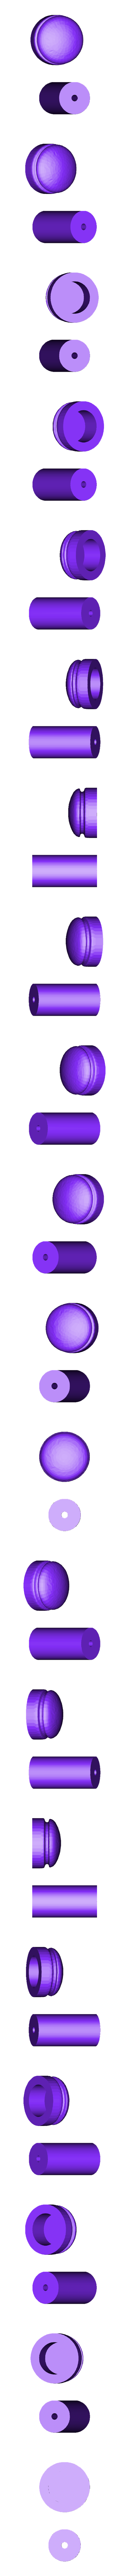 14-tail-knob.stl Download free STL file Violin • 3D print design, jteix